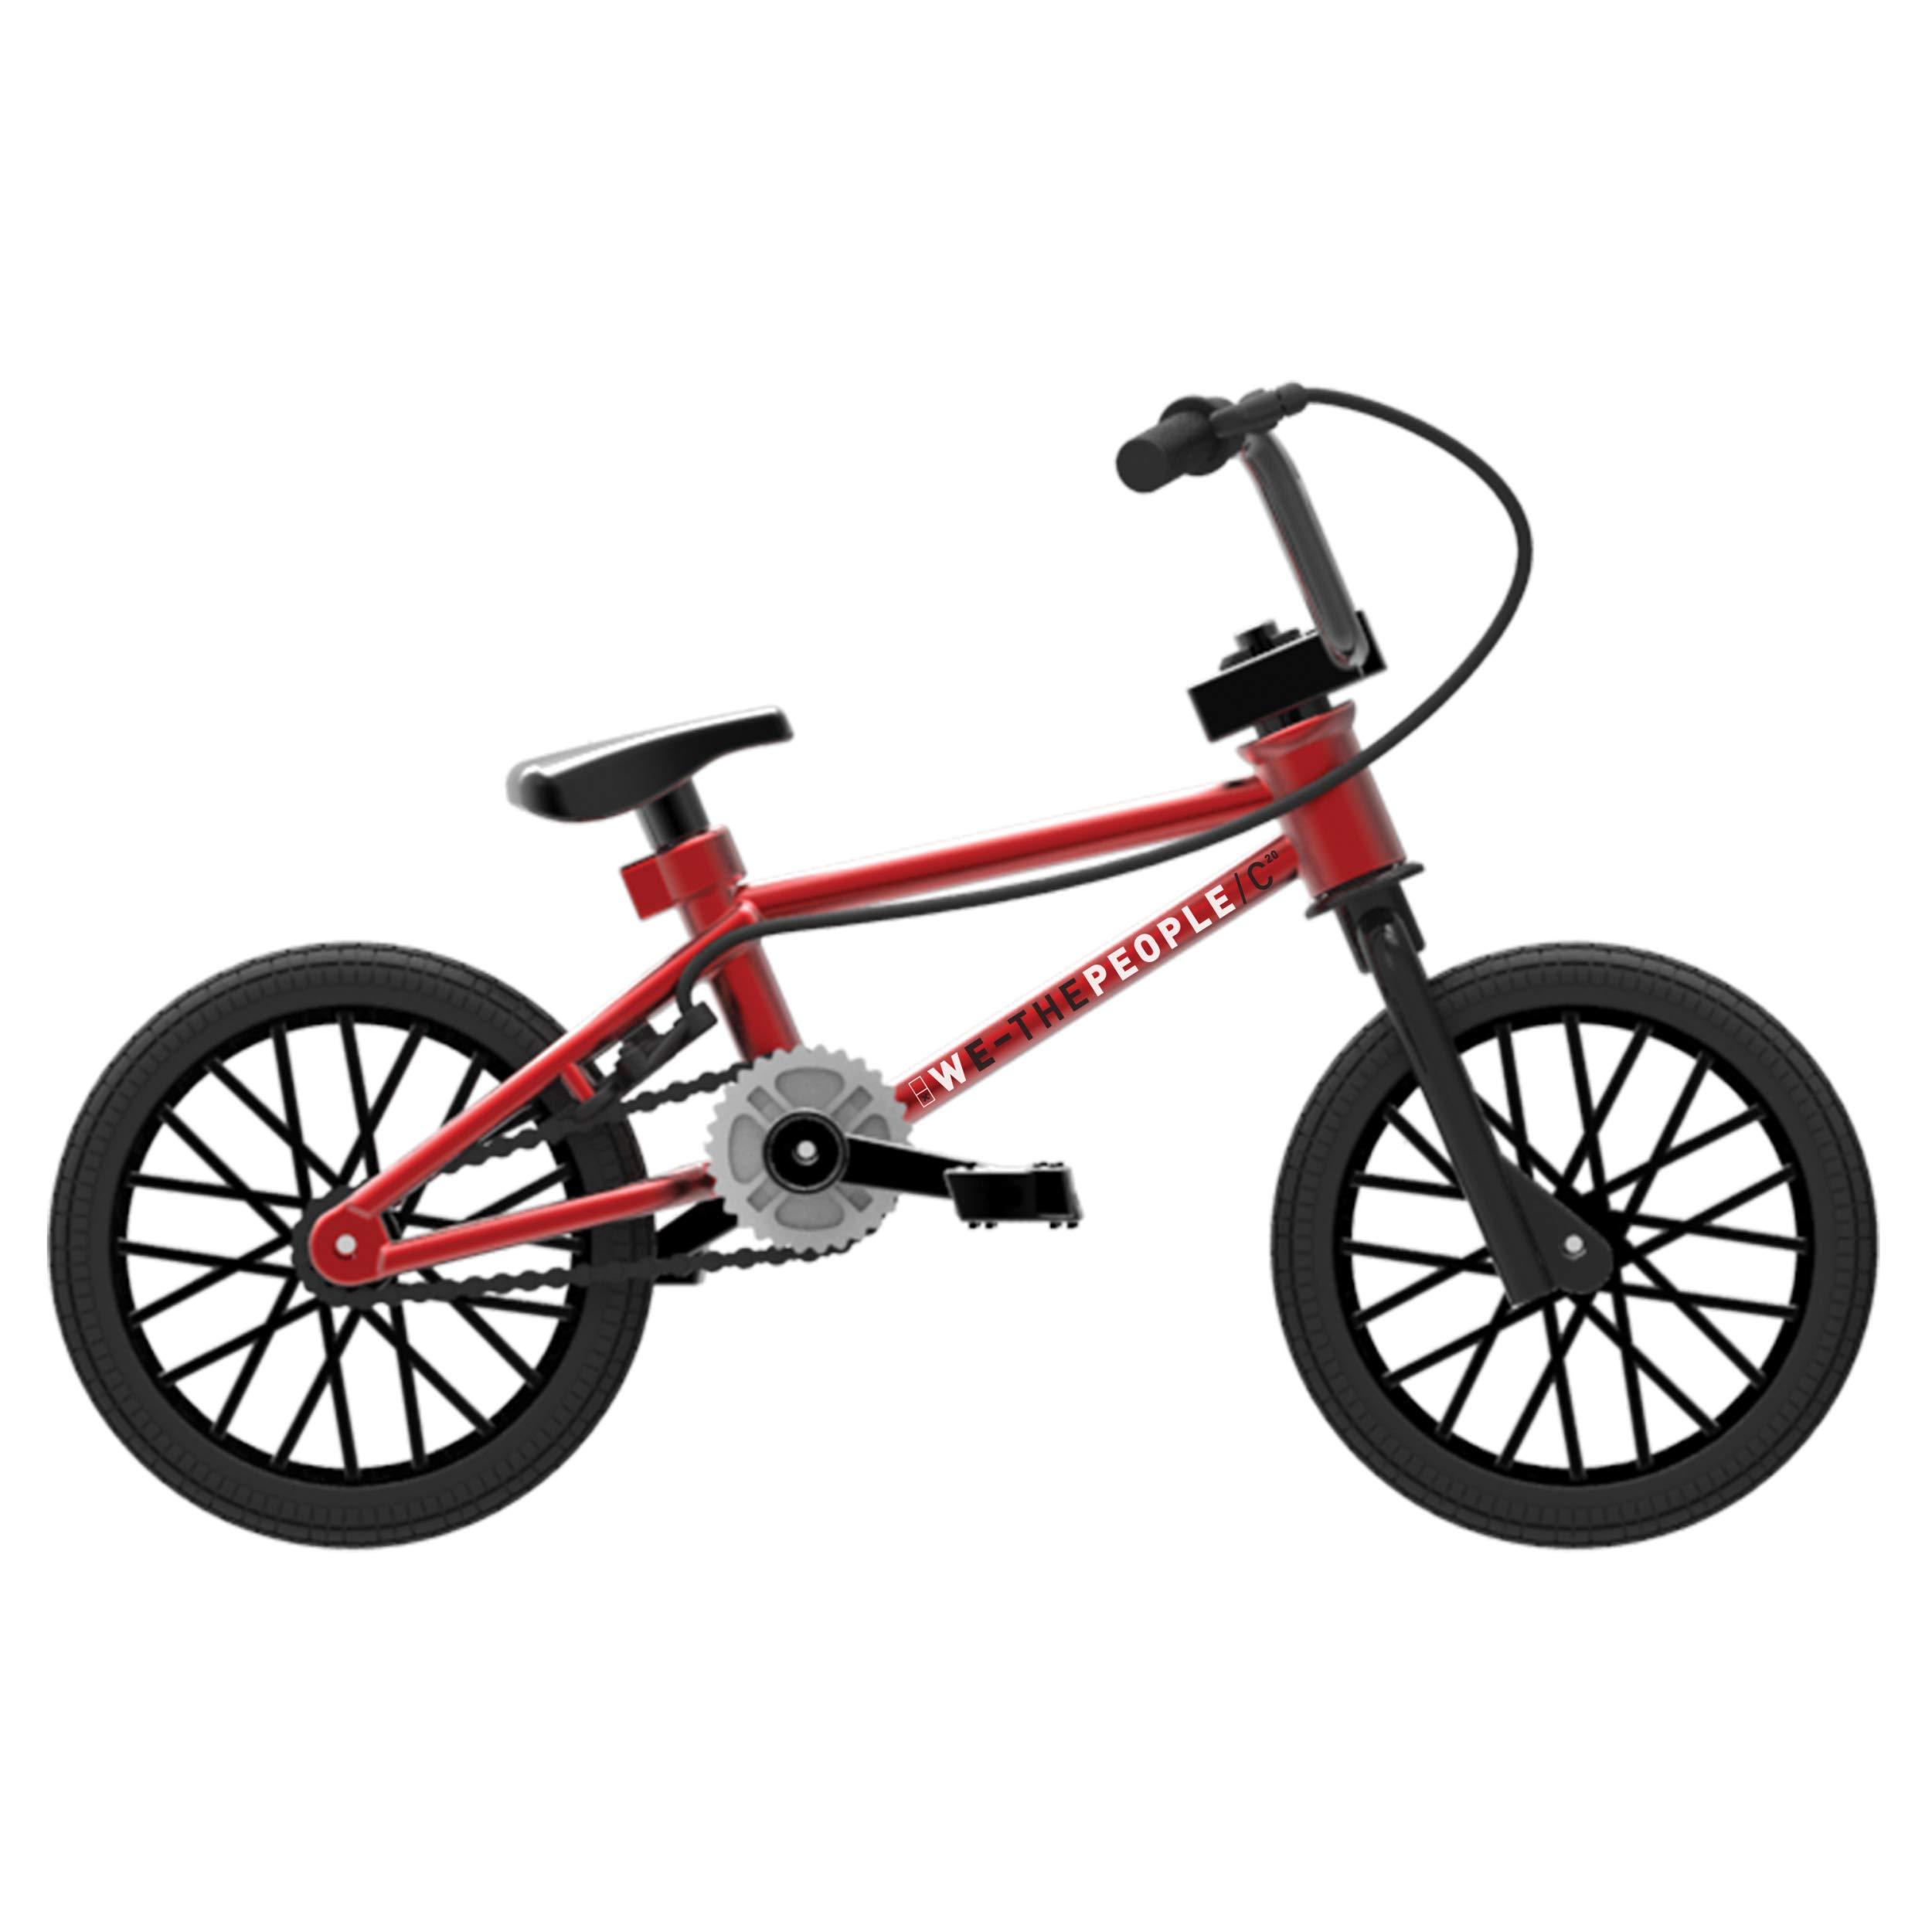 Tech Deck - BMX Finger Bike – WeThePeople – Red/Black – Series 6 by Tech Deck (Image #2)